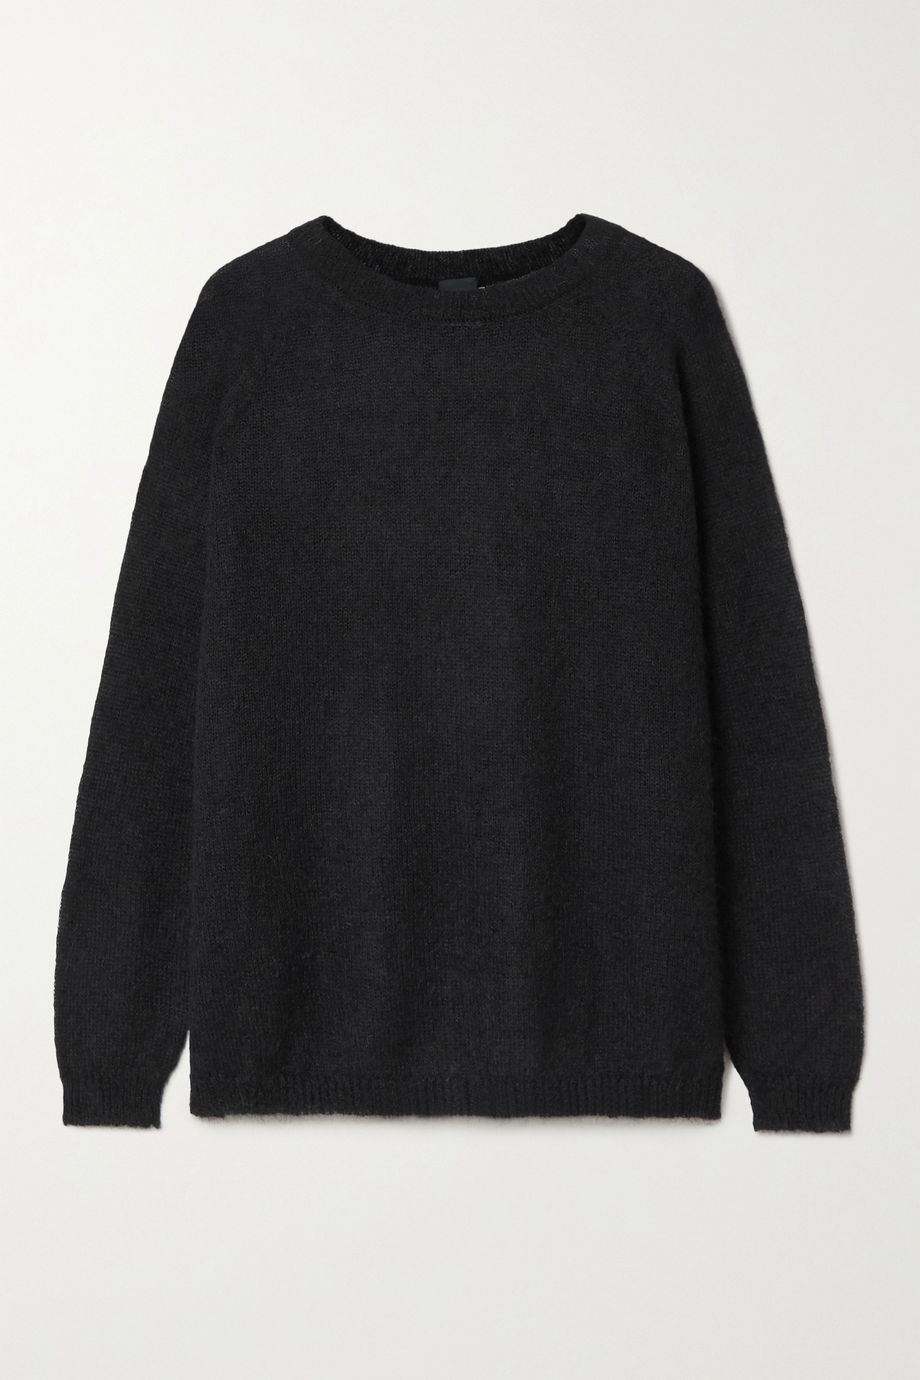 Max Mara Leisure Geode mohair-blend sweater